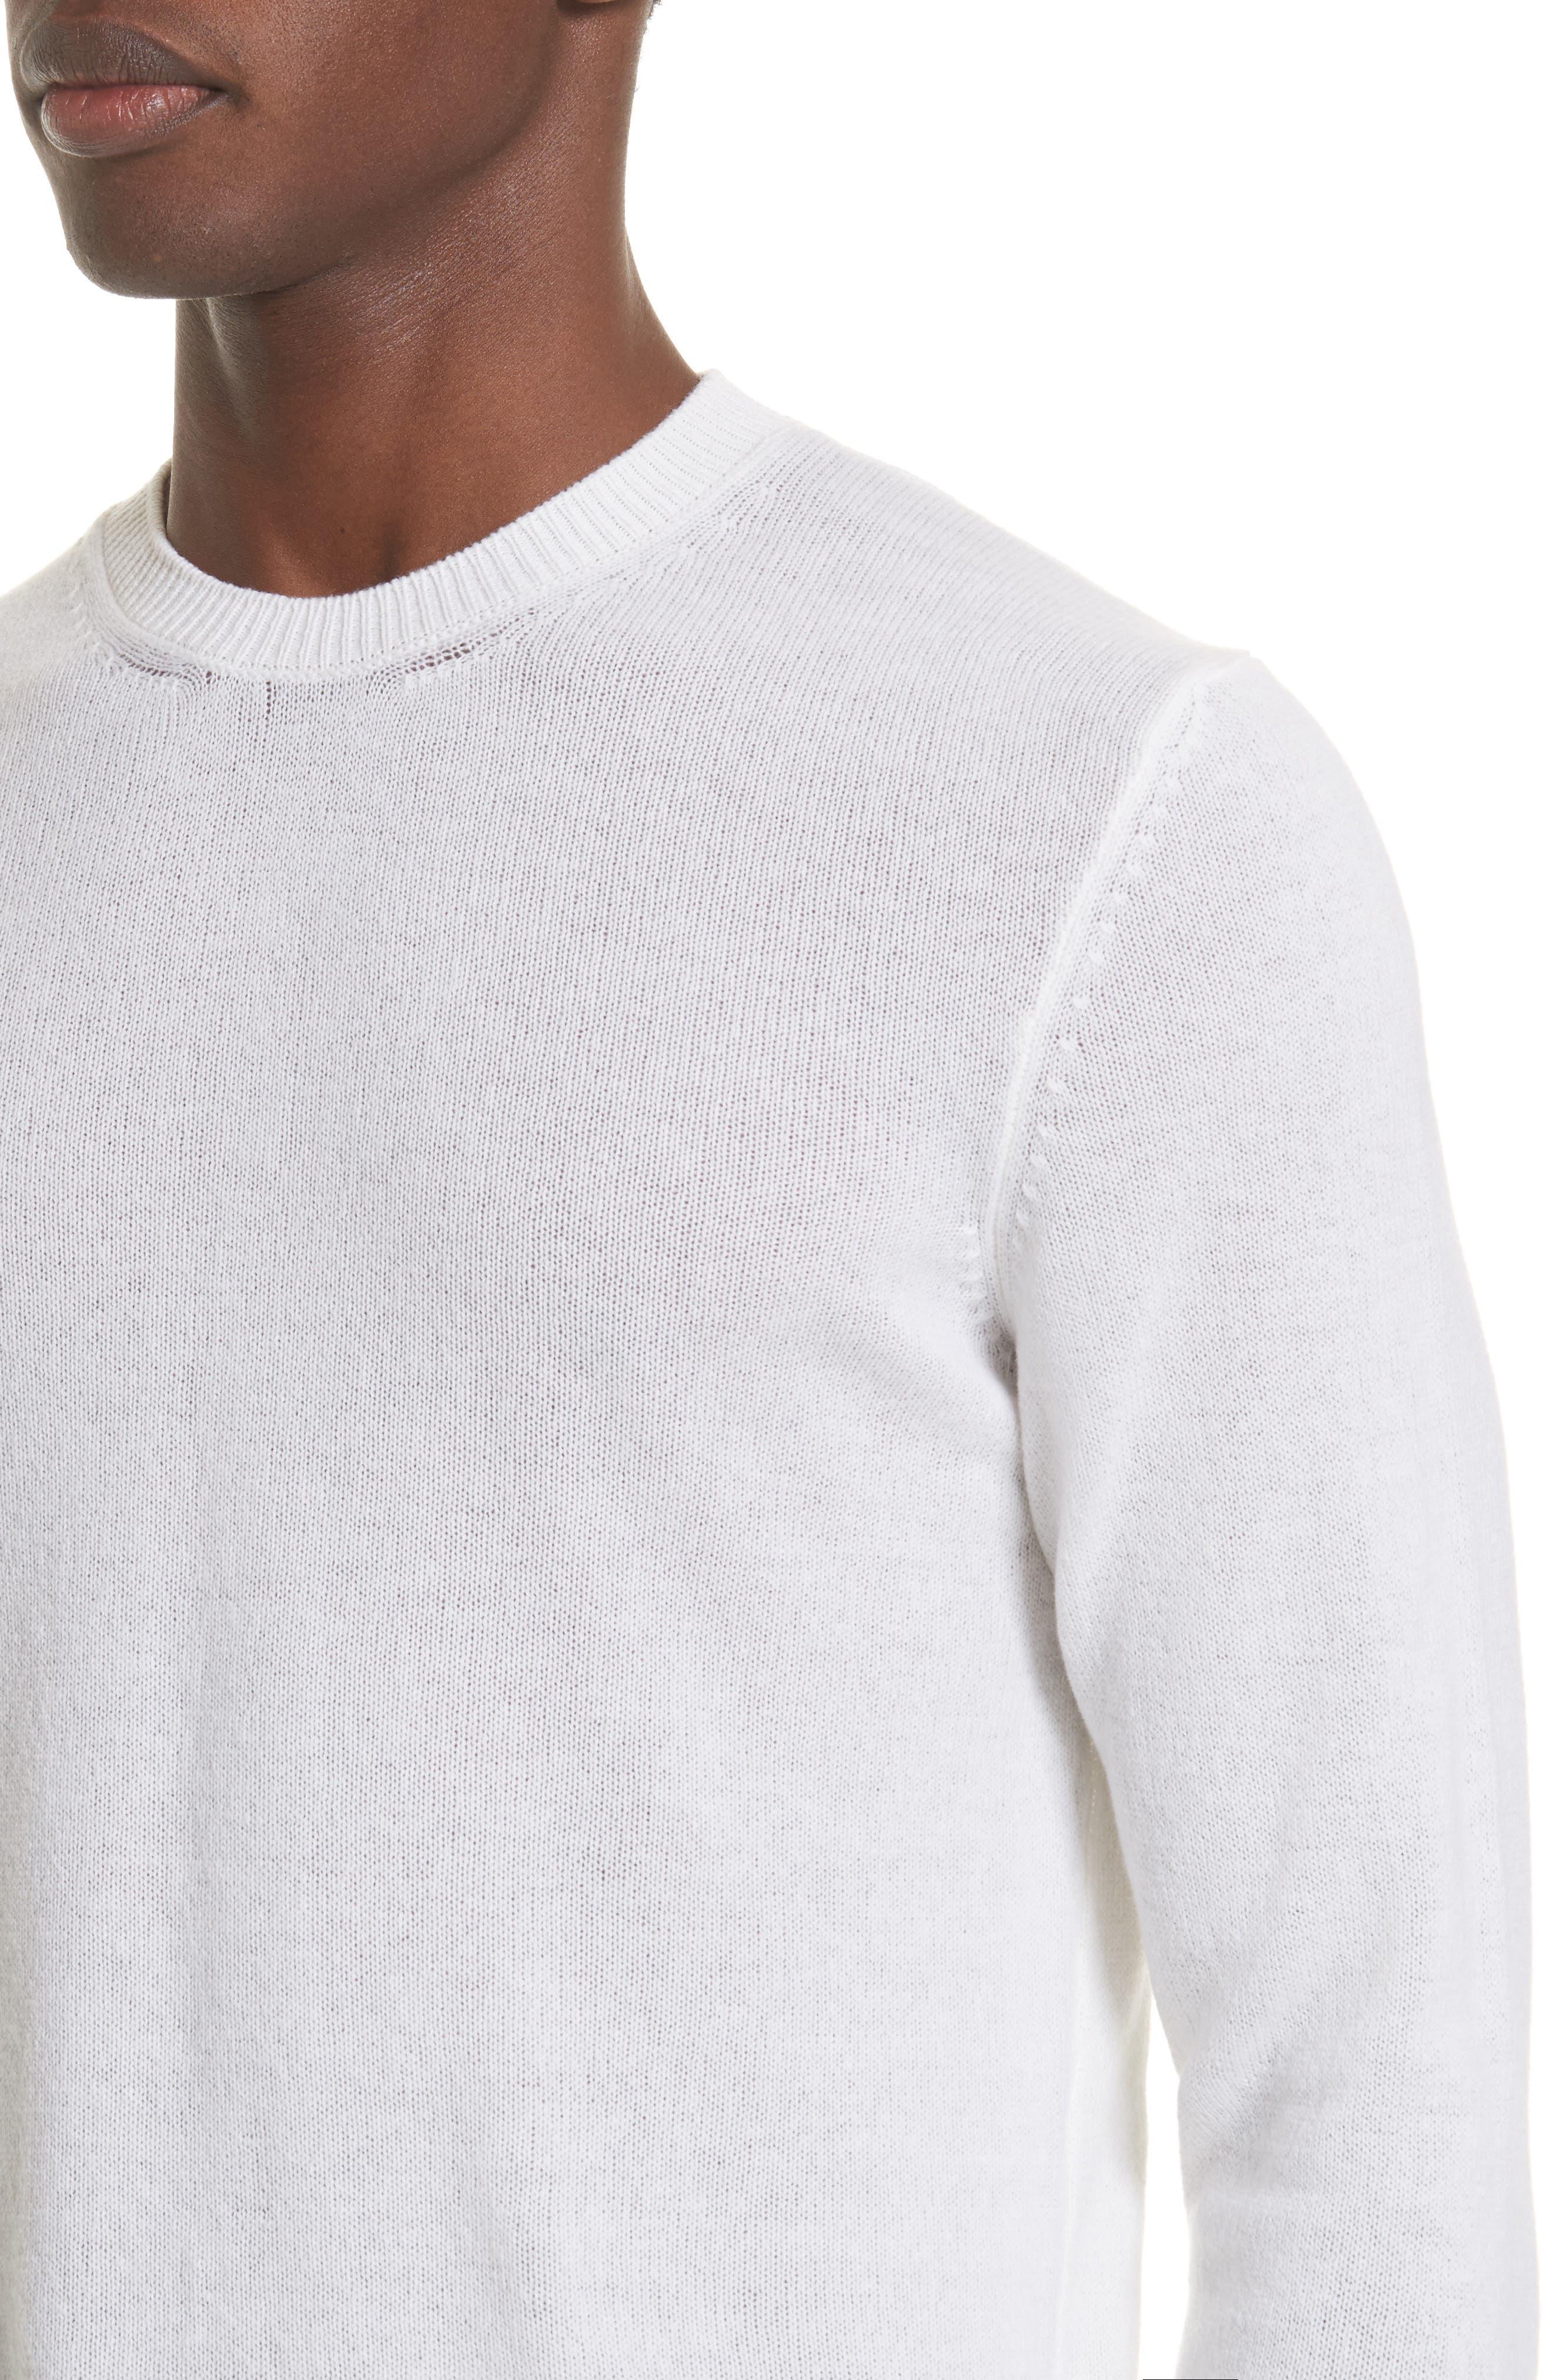 Cashmere Crewneck Sweater,                             Alternate thumbnail 4, color,                             White